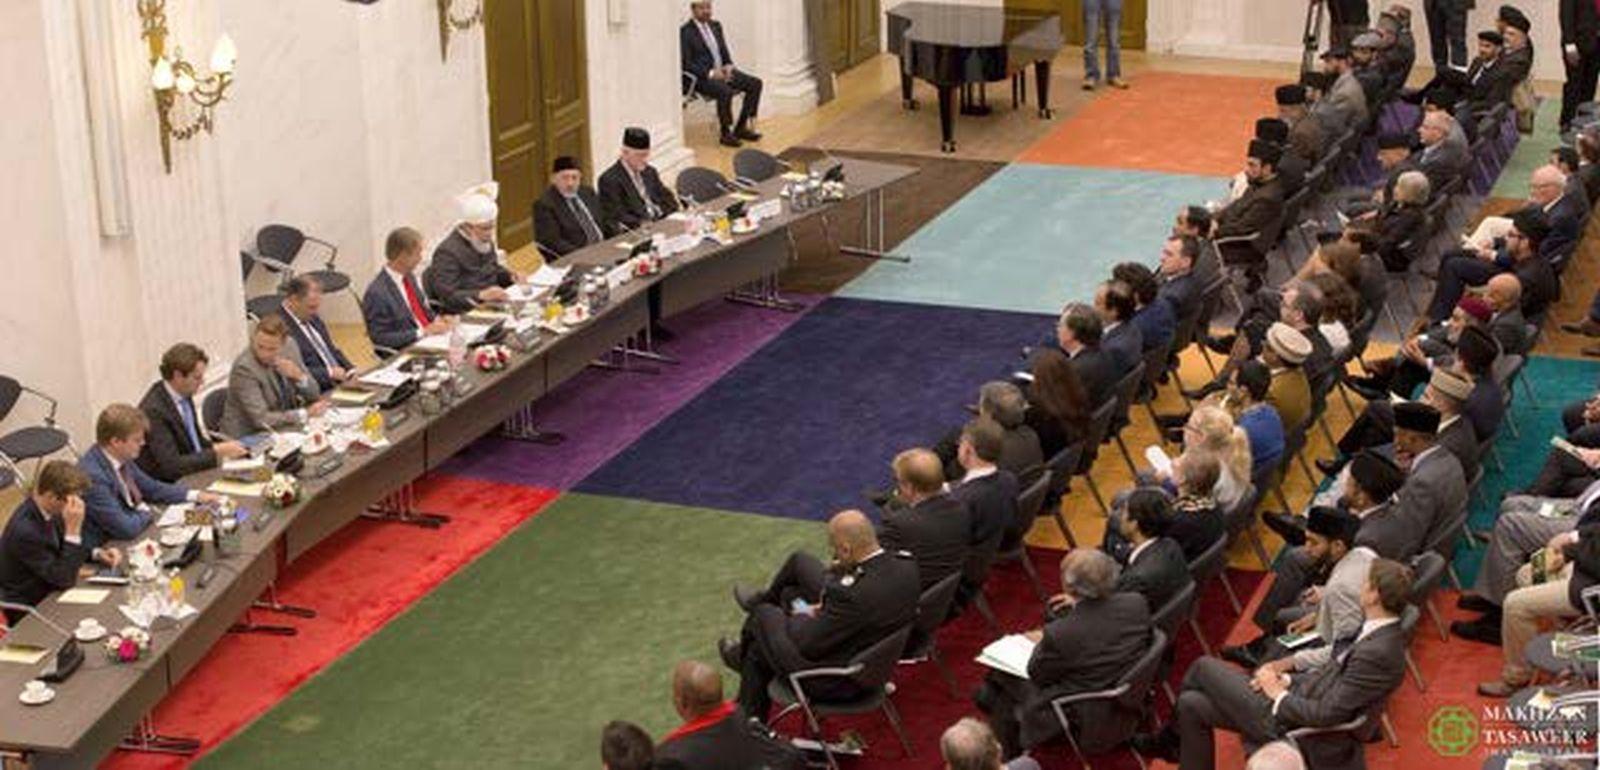 2015-10-06 - Parlamenti Holandez